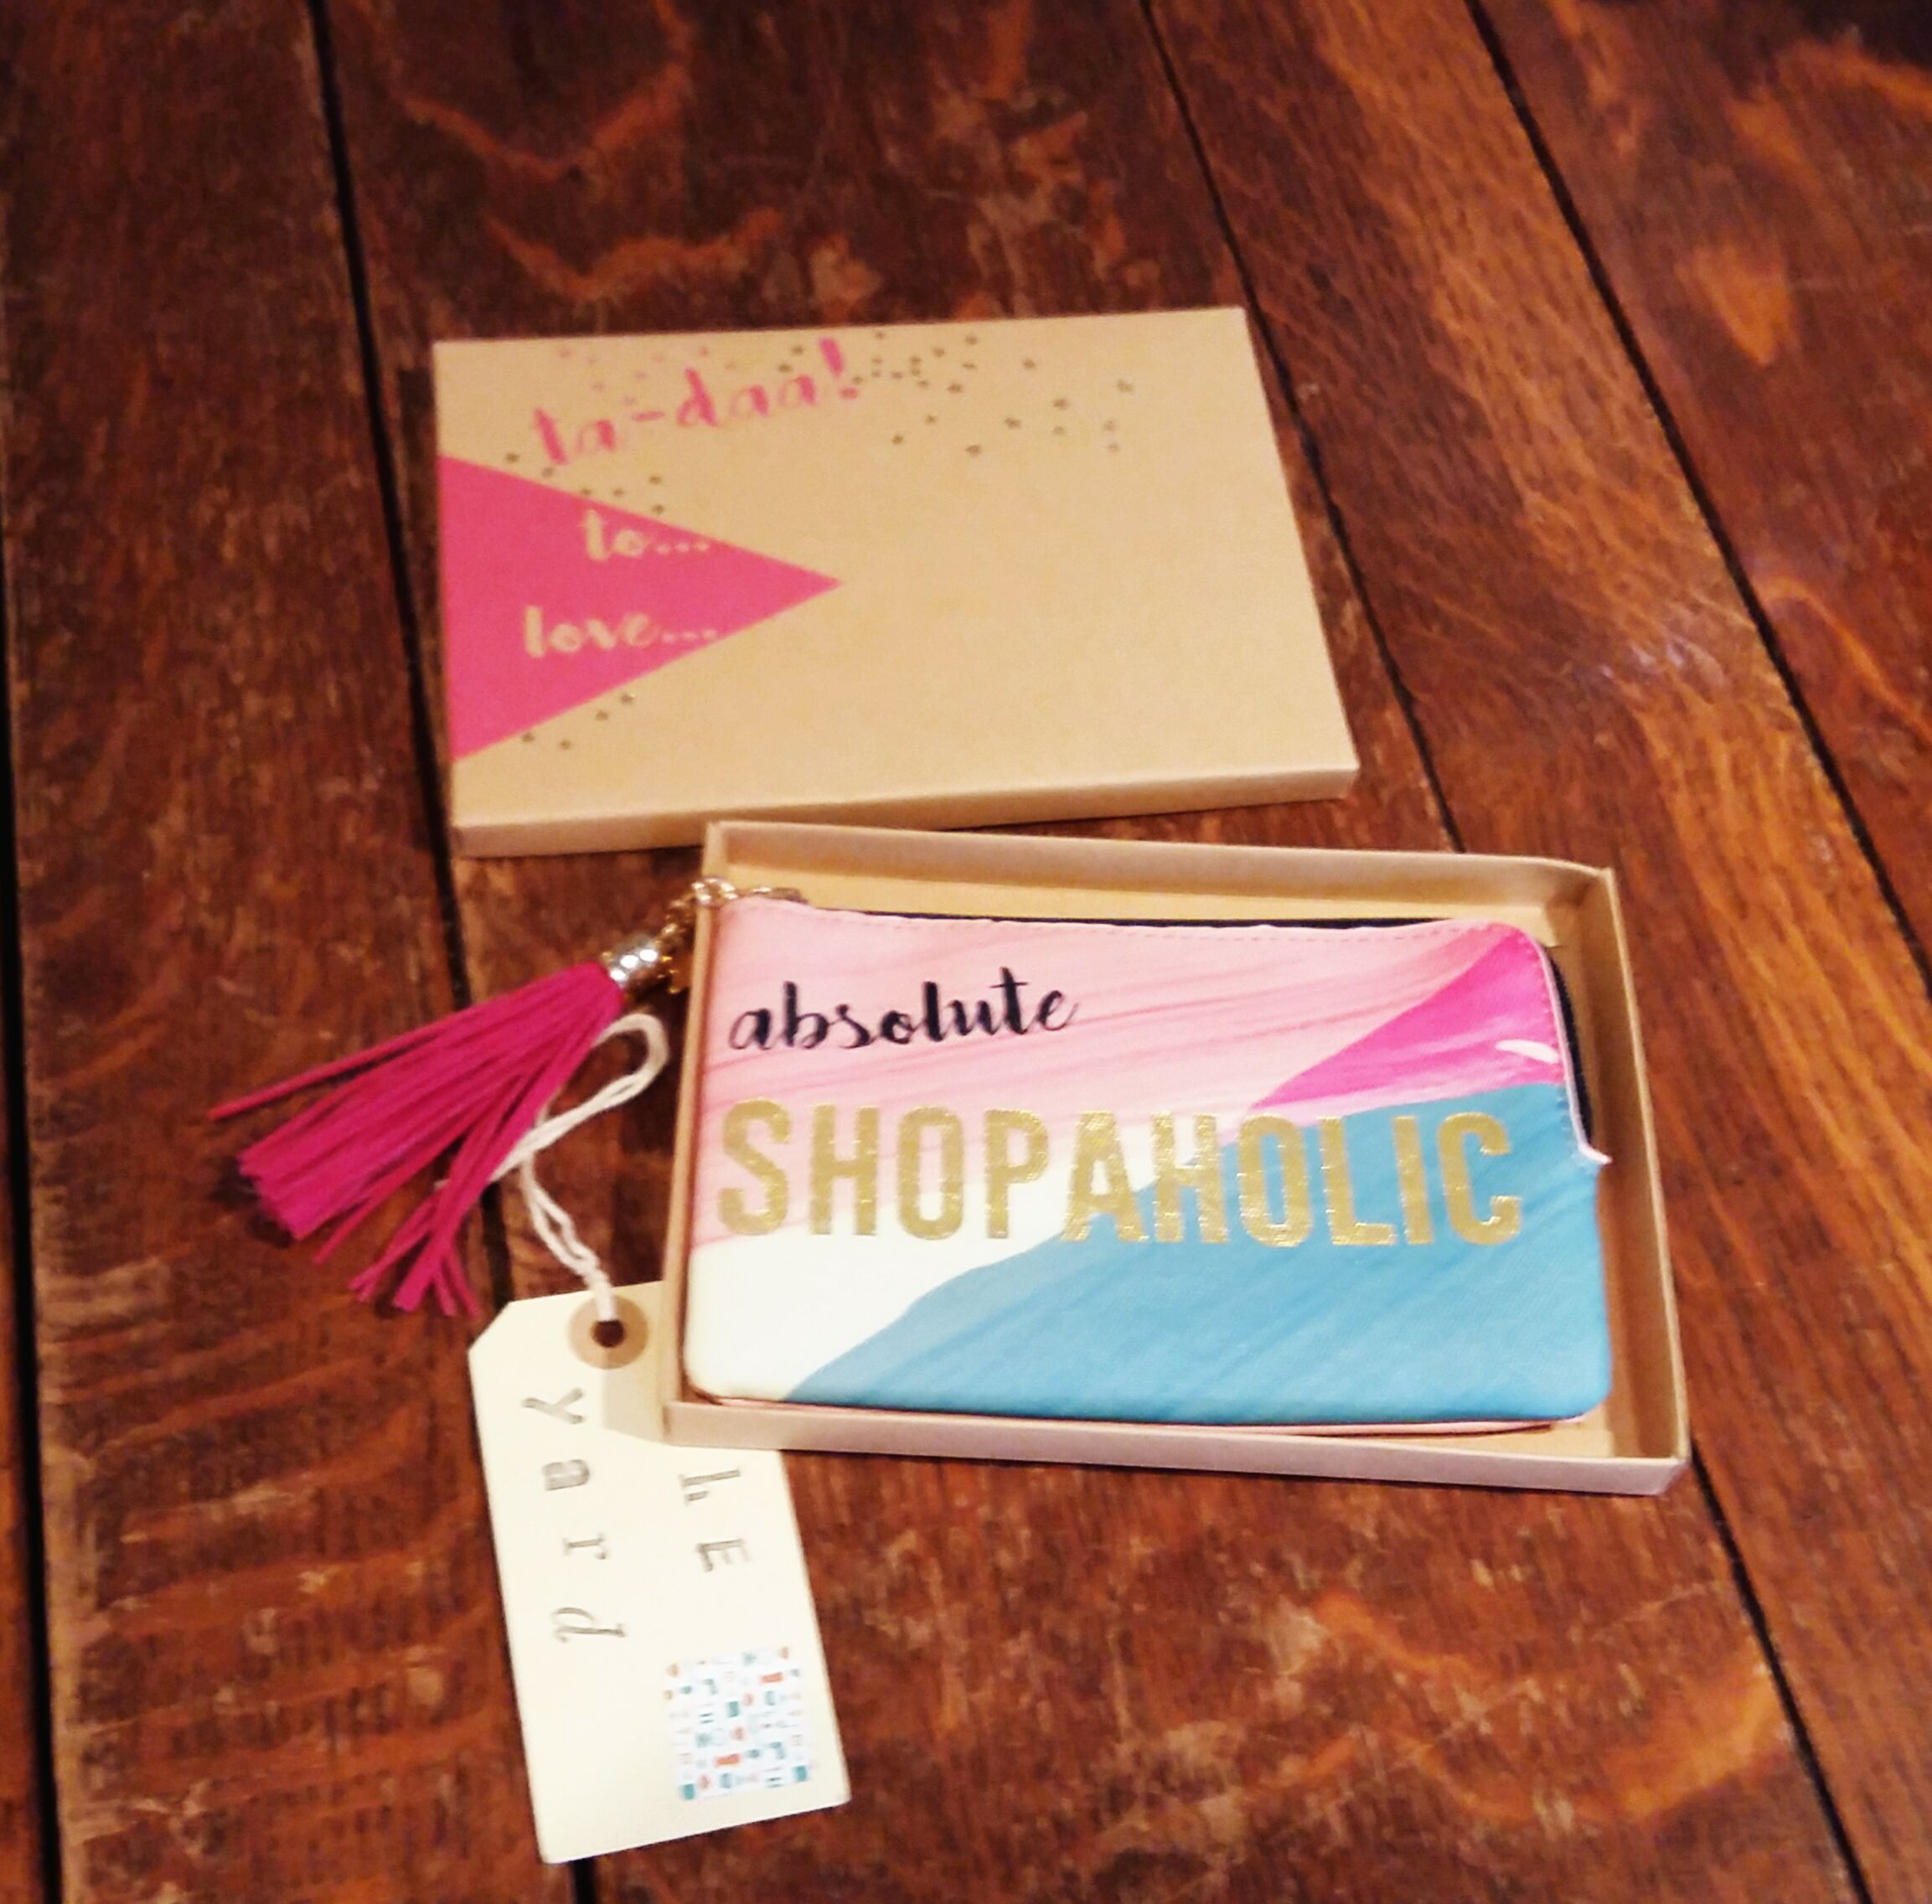 Shopaholic boxed purse makes a great present